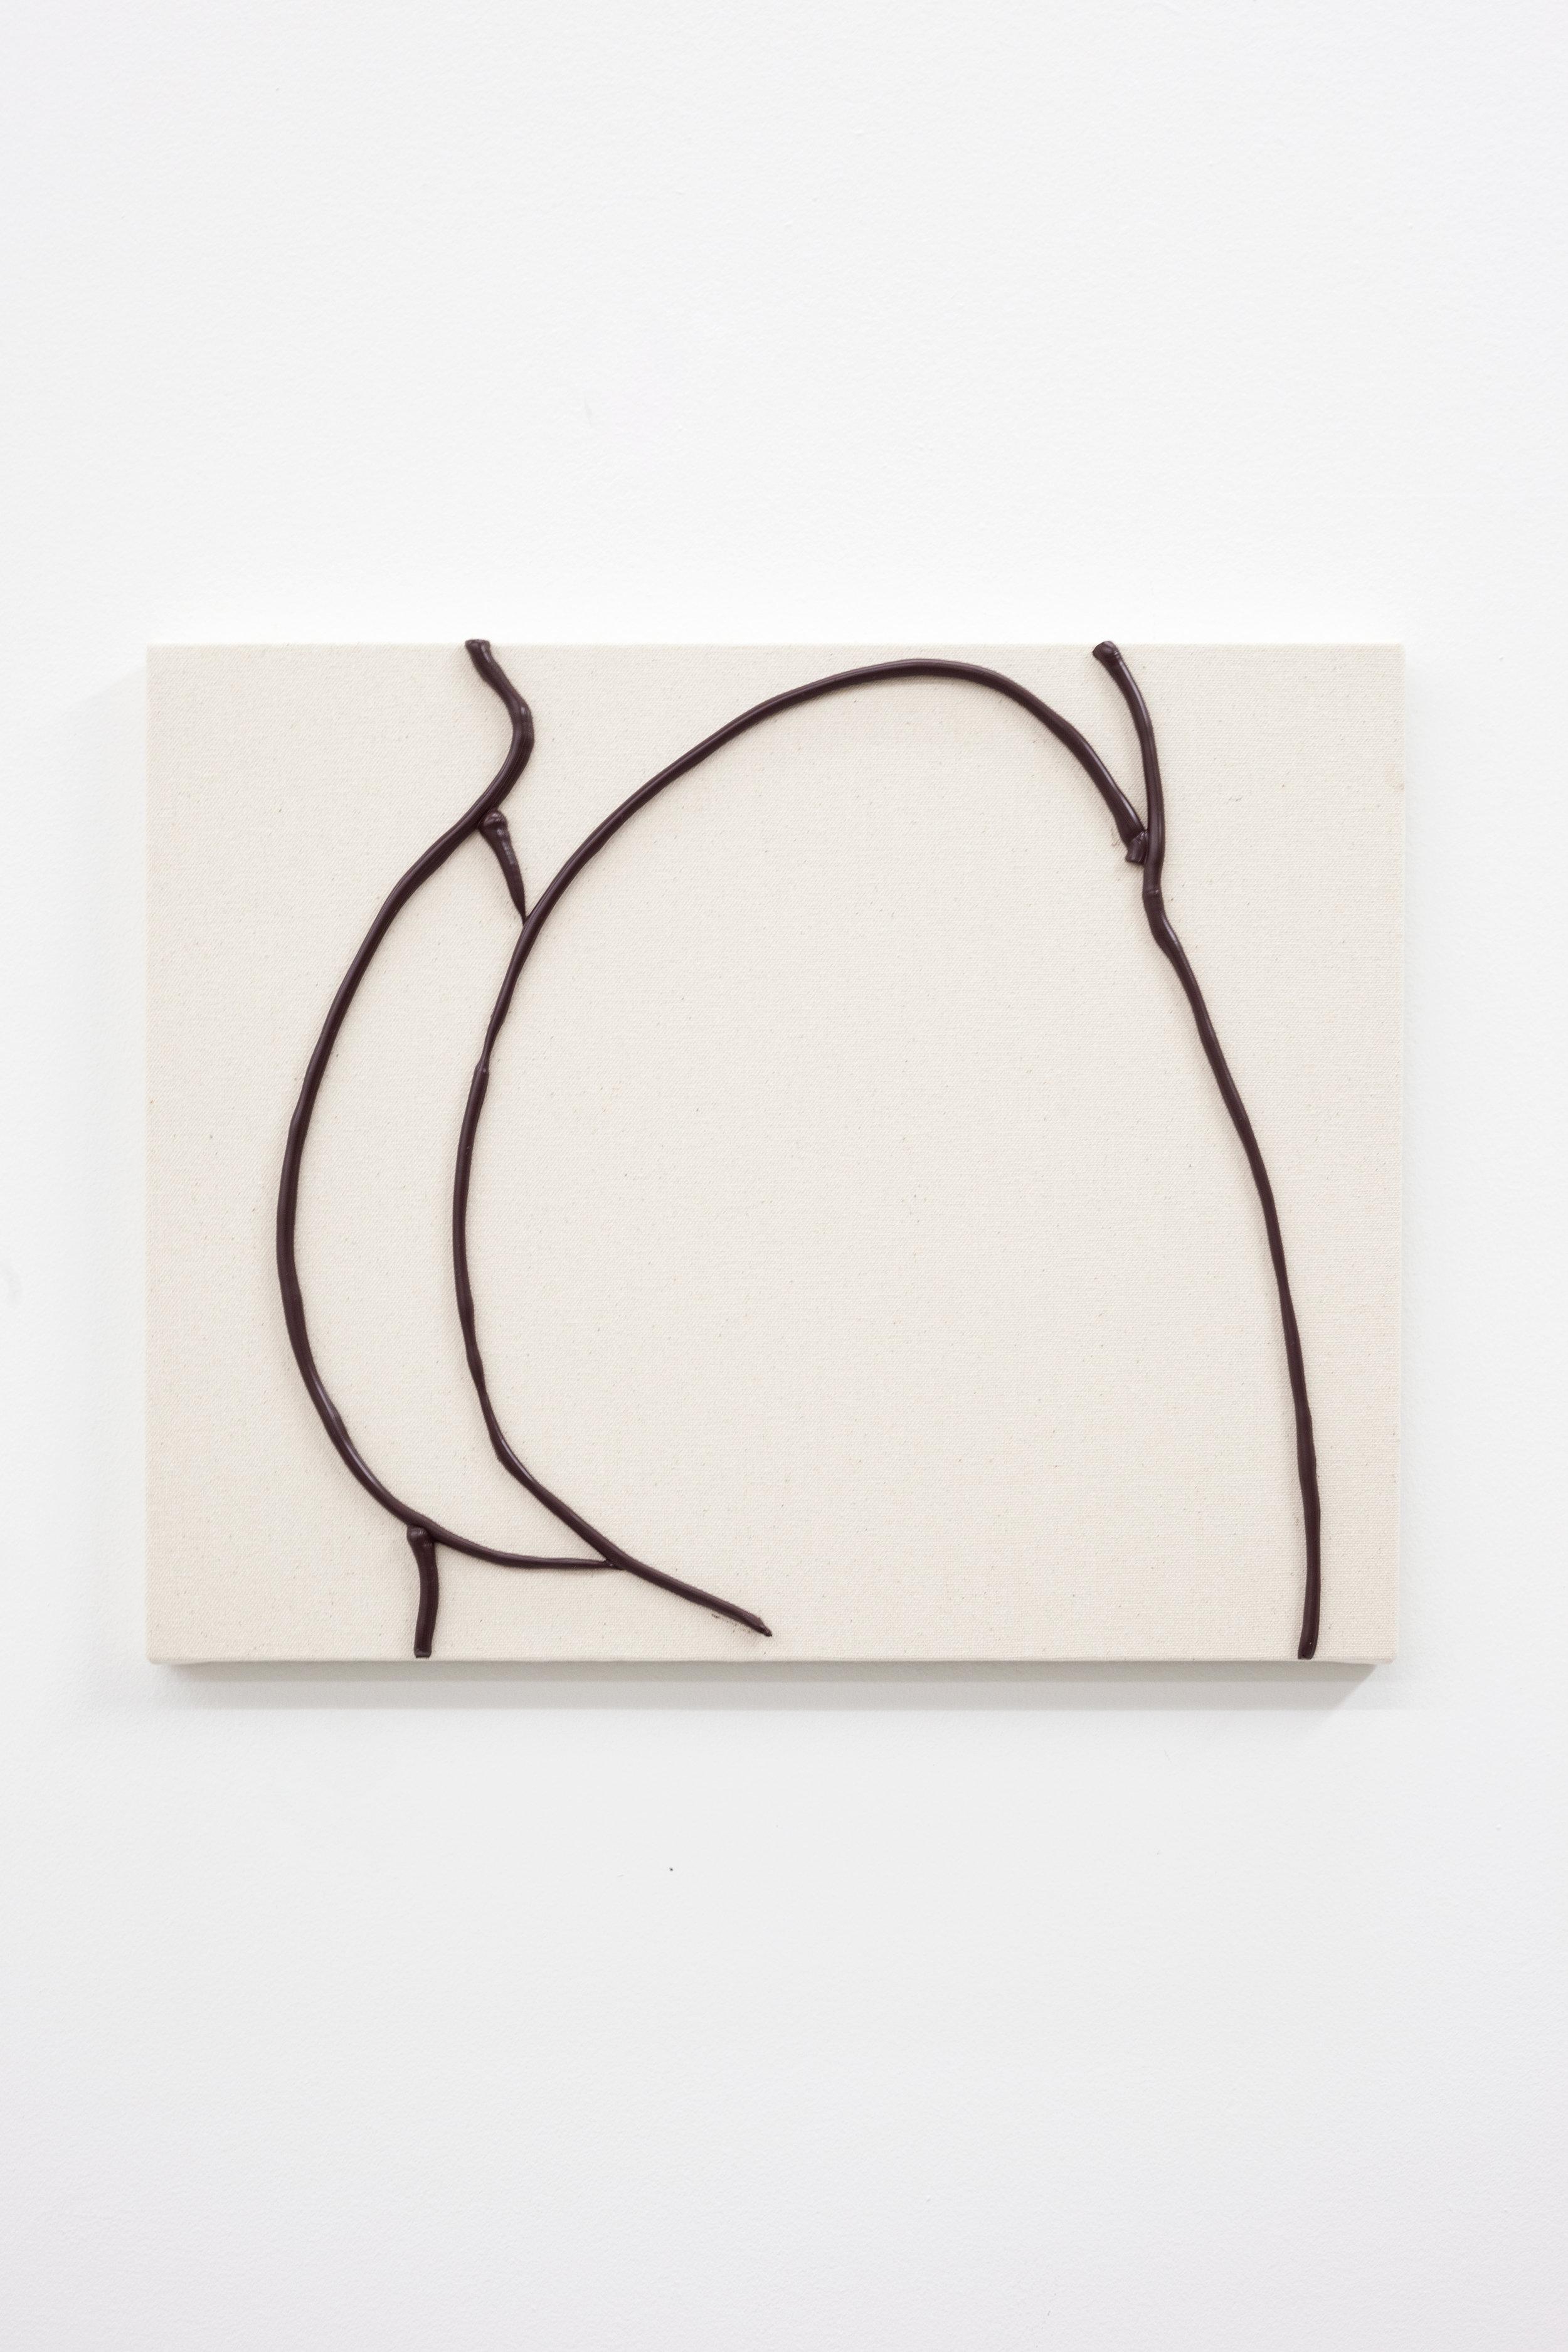 Omari Douglin,  Untitled (Butt Painting),  2019, Caulk on Raw Canvas, 13x16in